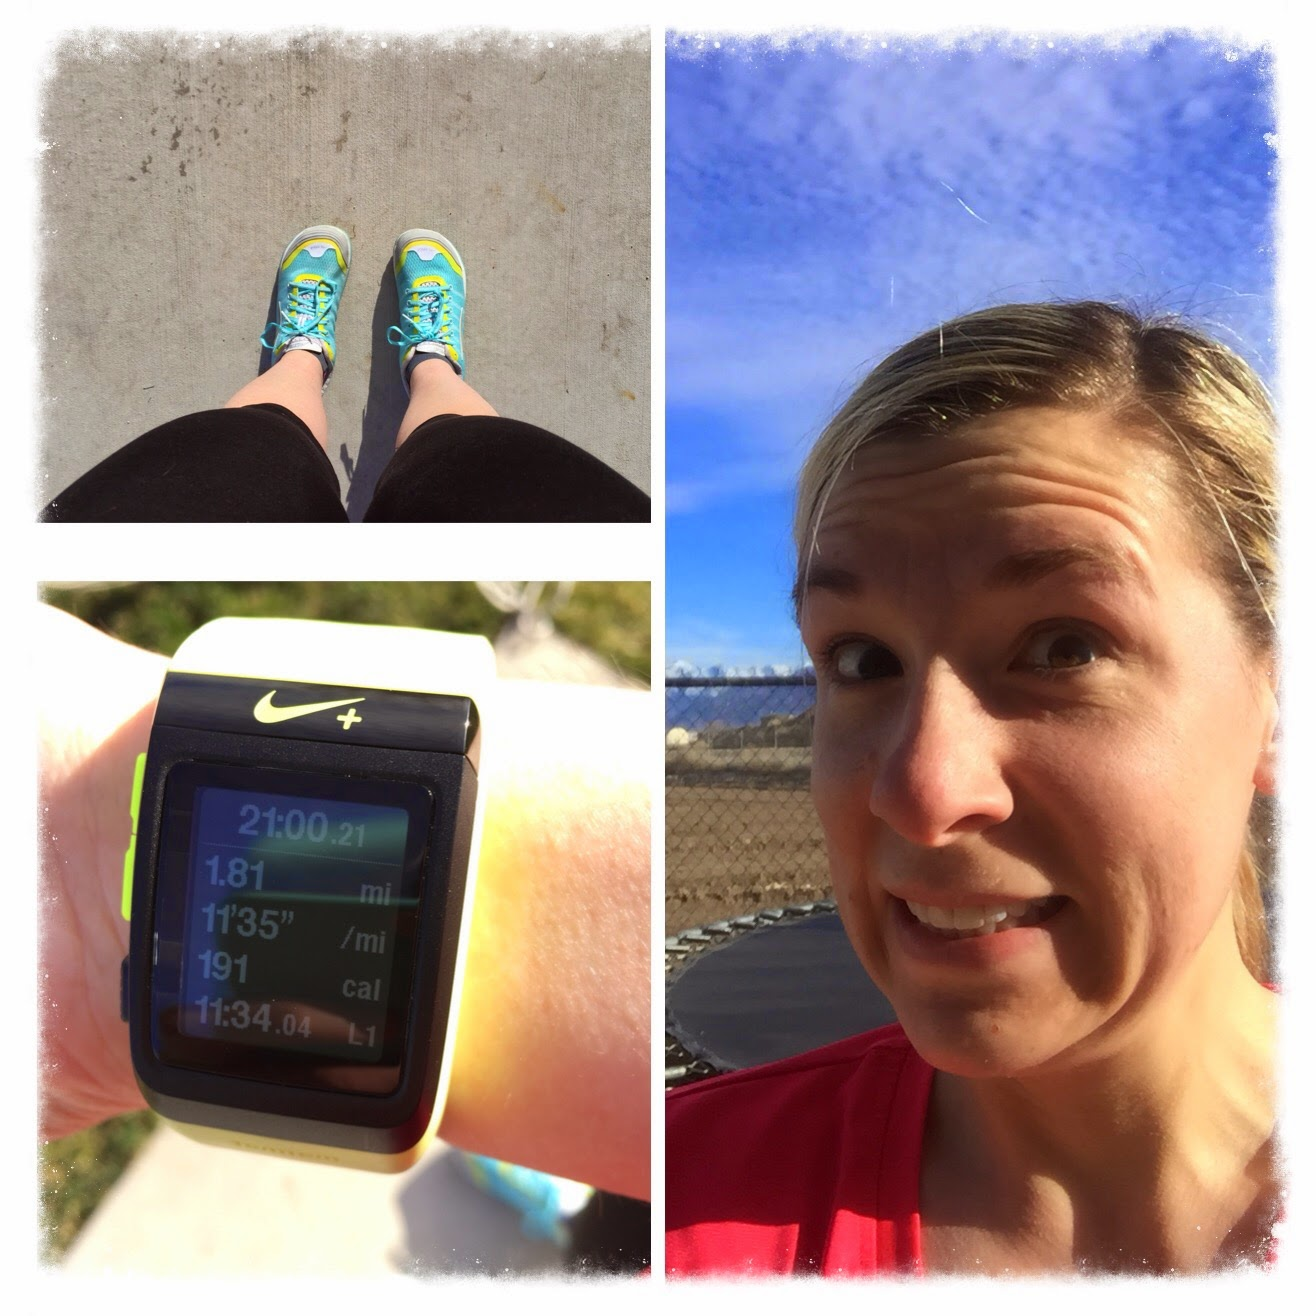 running and feeling good